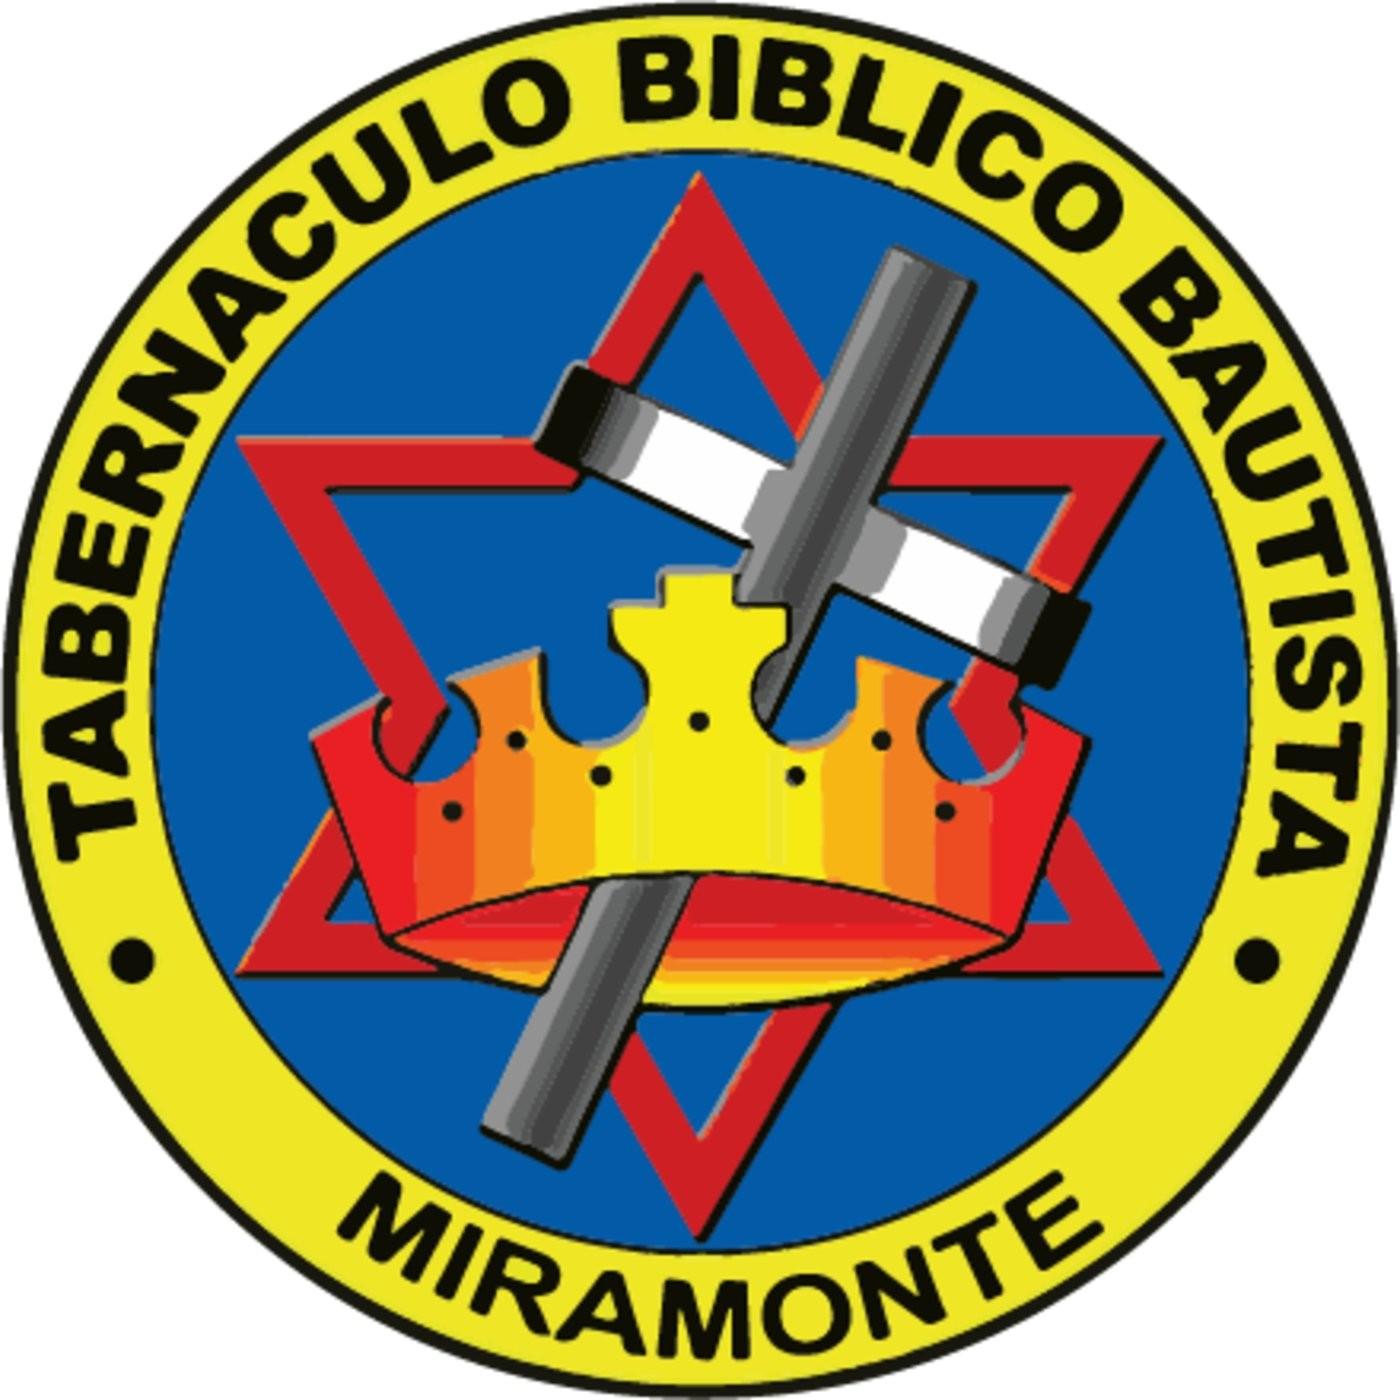 <![CDATA[Sermones de Taber Miramonte]]>